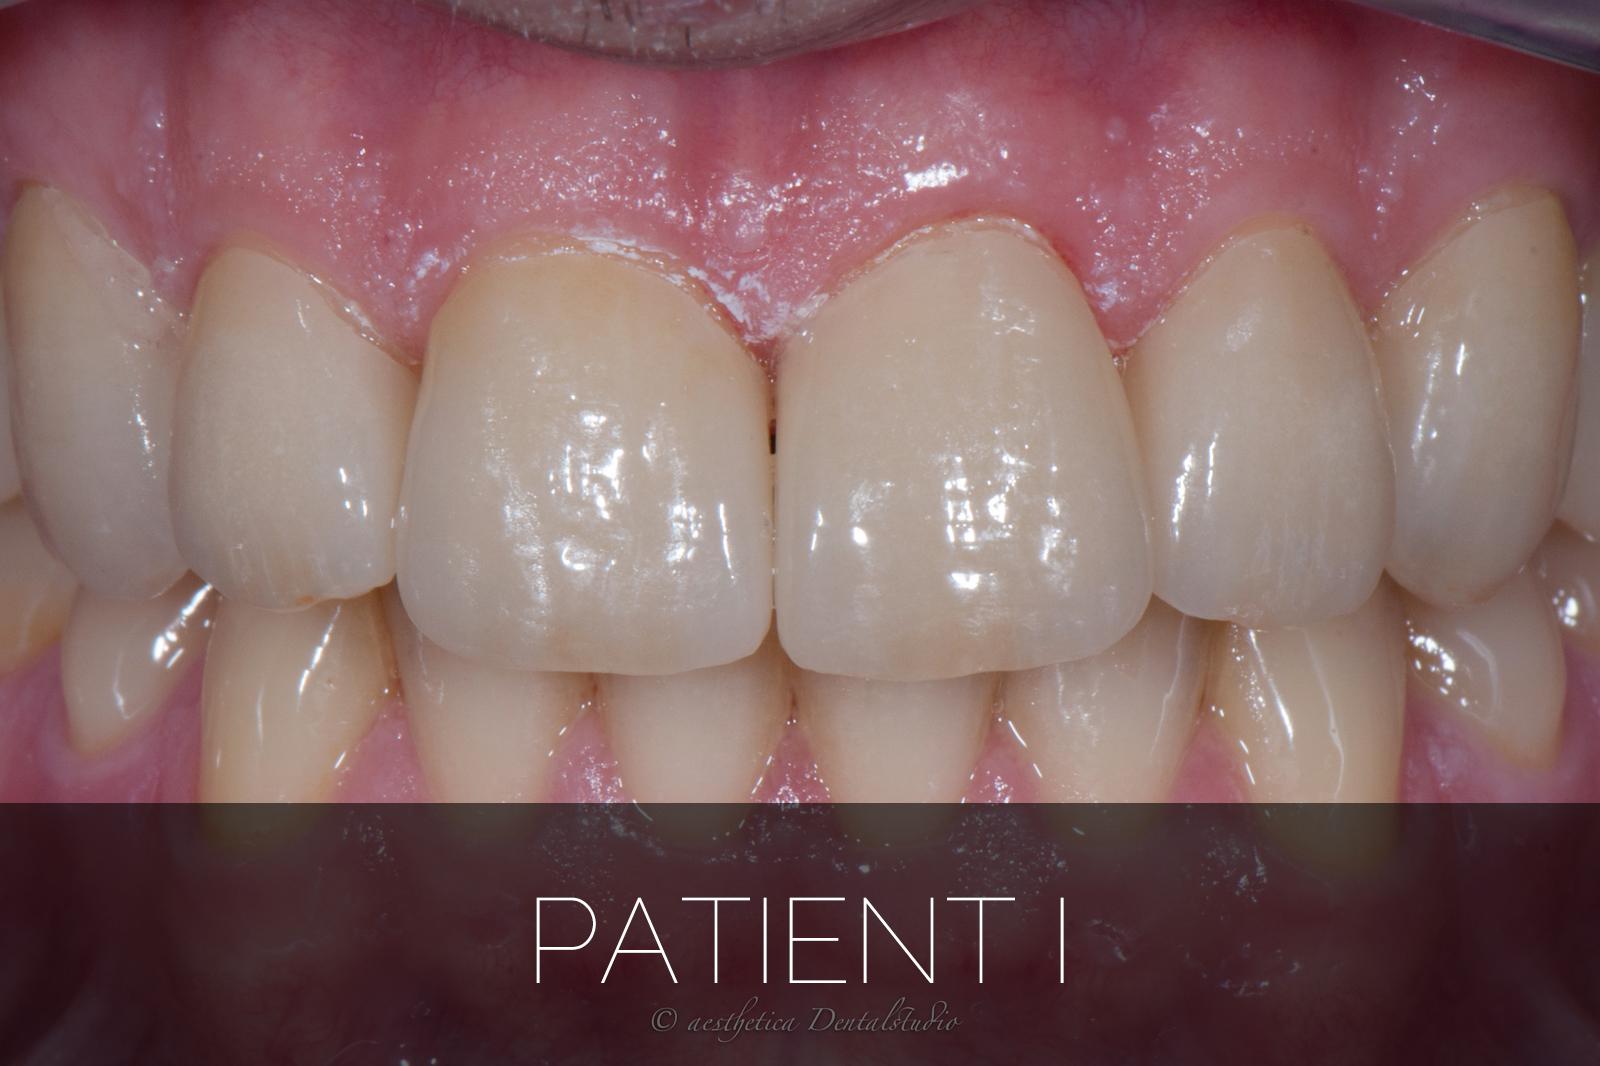 Patient I